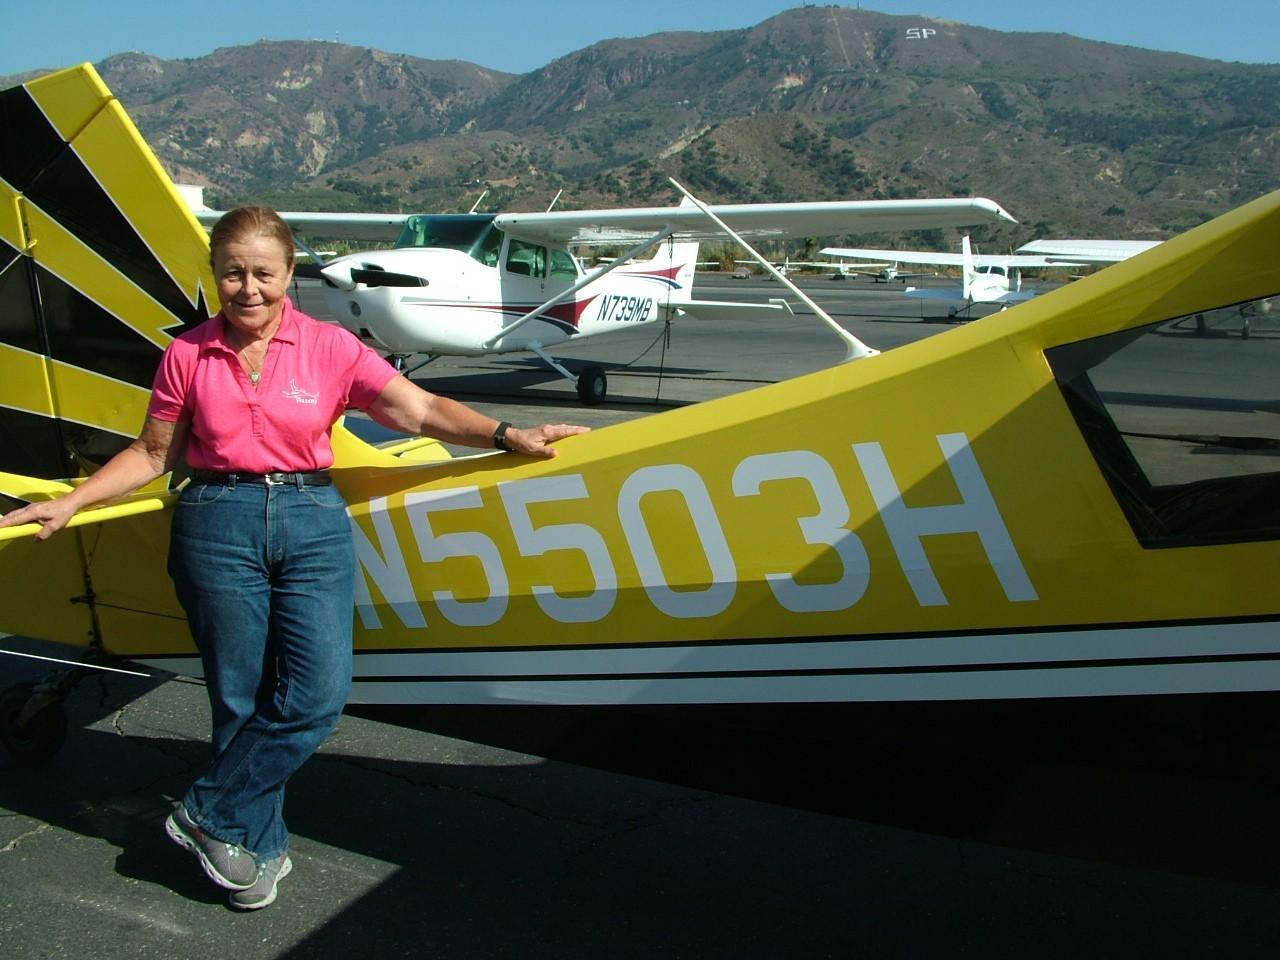 Emergency Maneuver Training - Barbara Filkins